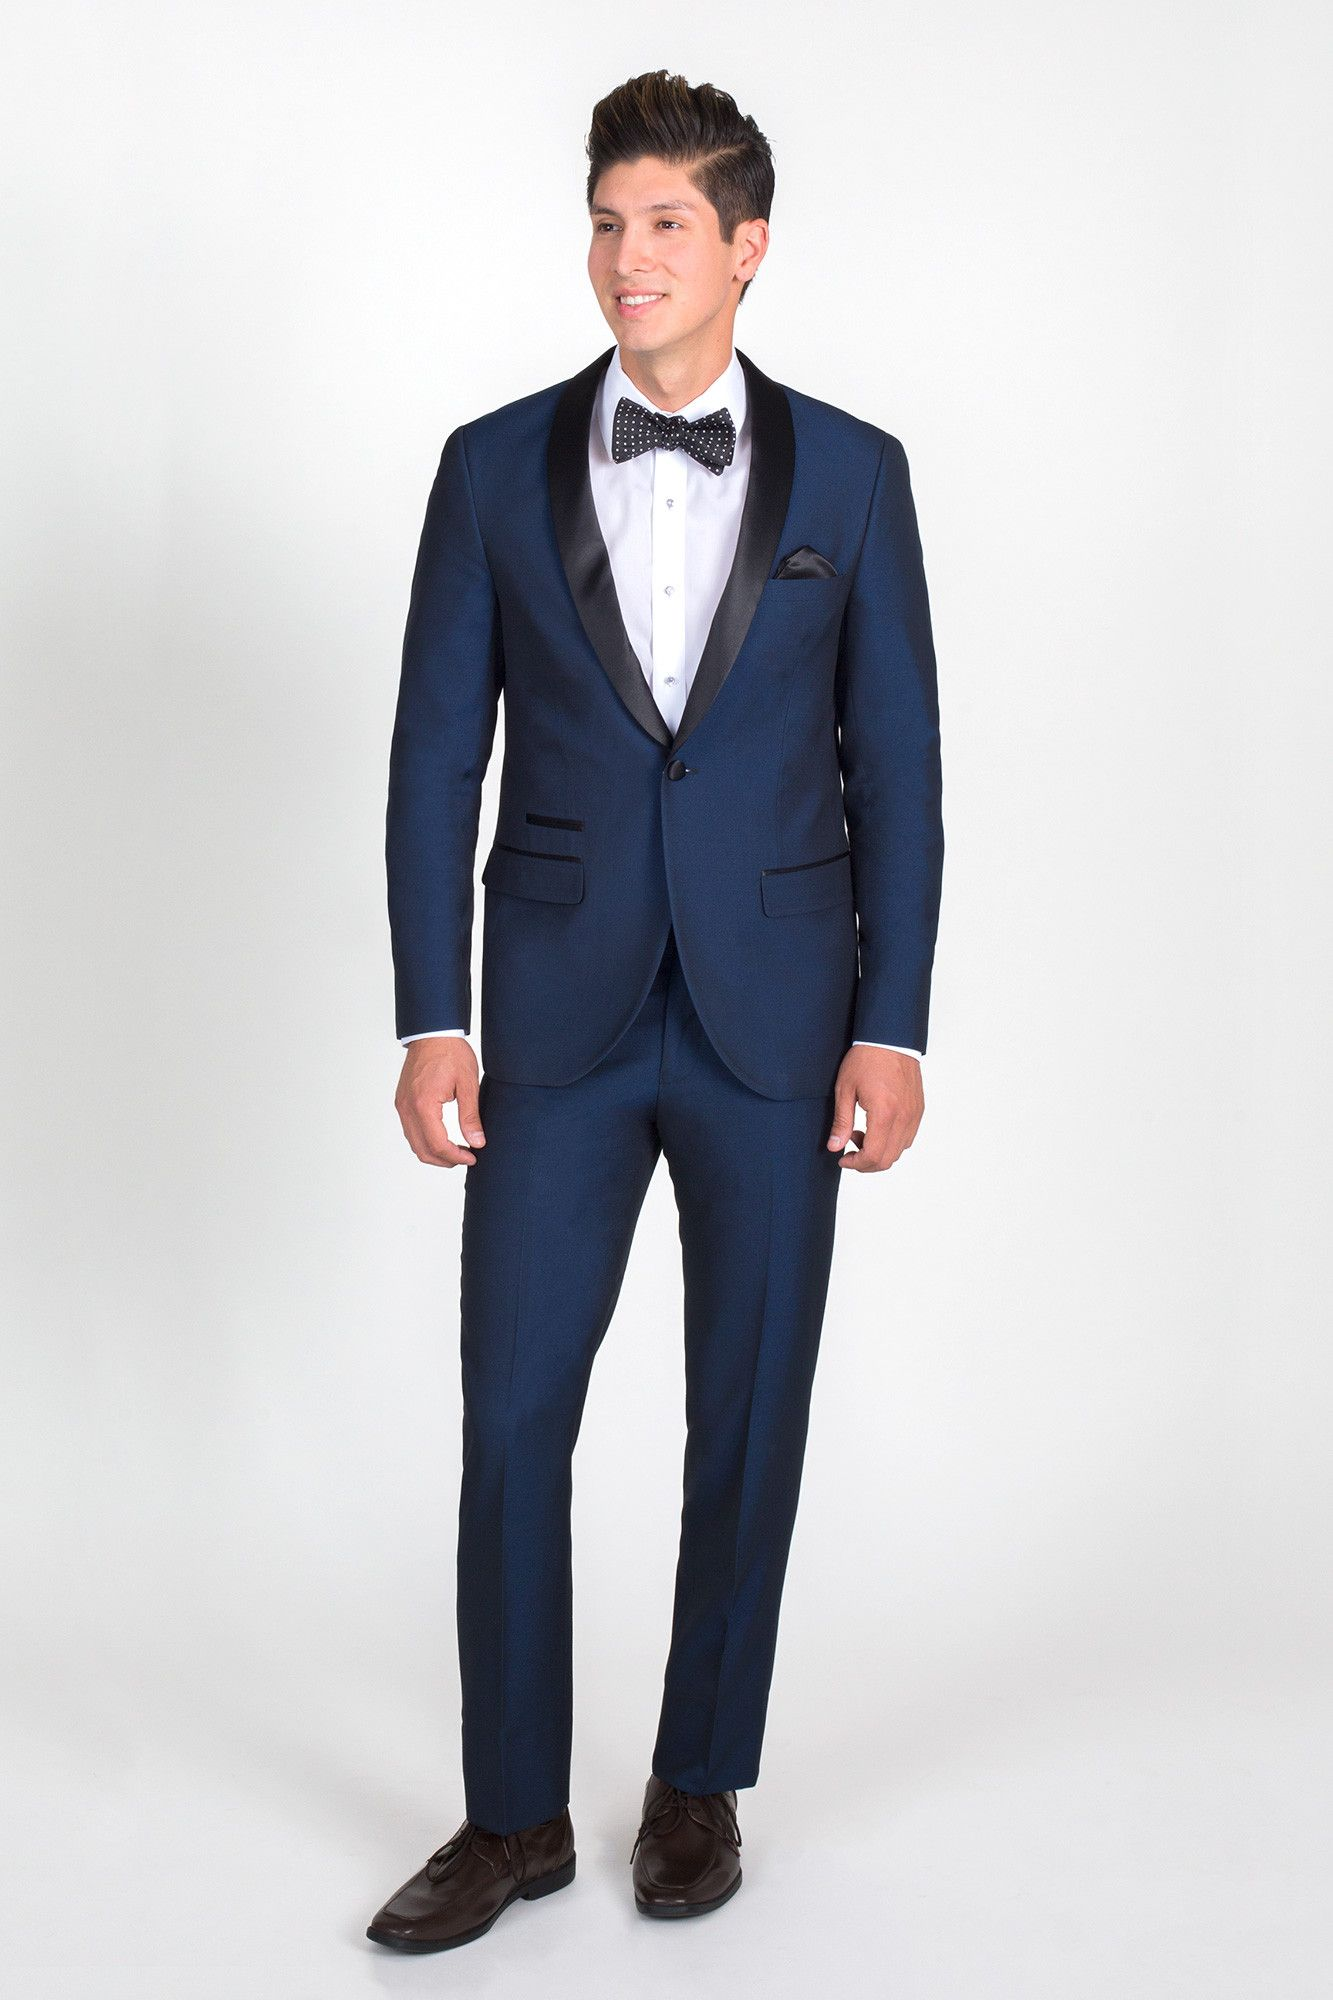 Navy Blue Slim Fit Tuxedo with Black Shawl Lapel   Wedding Ideas ...